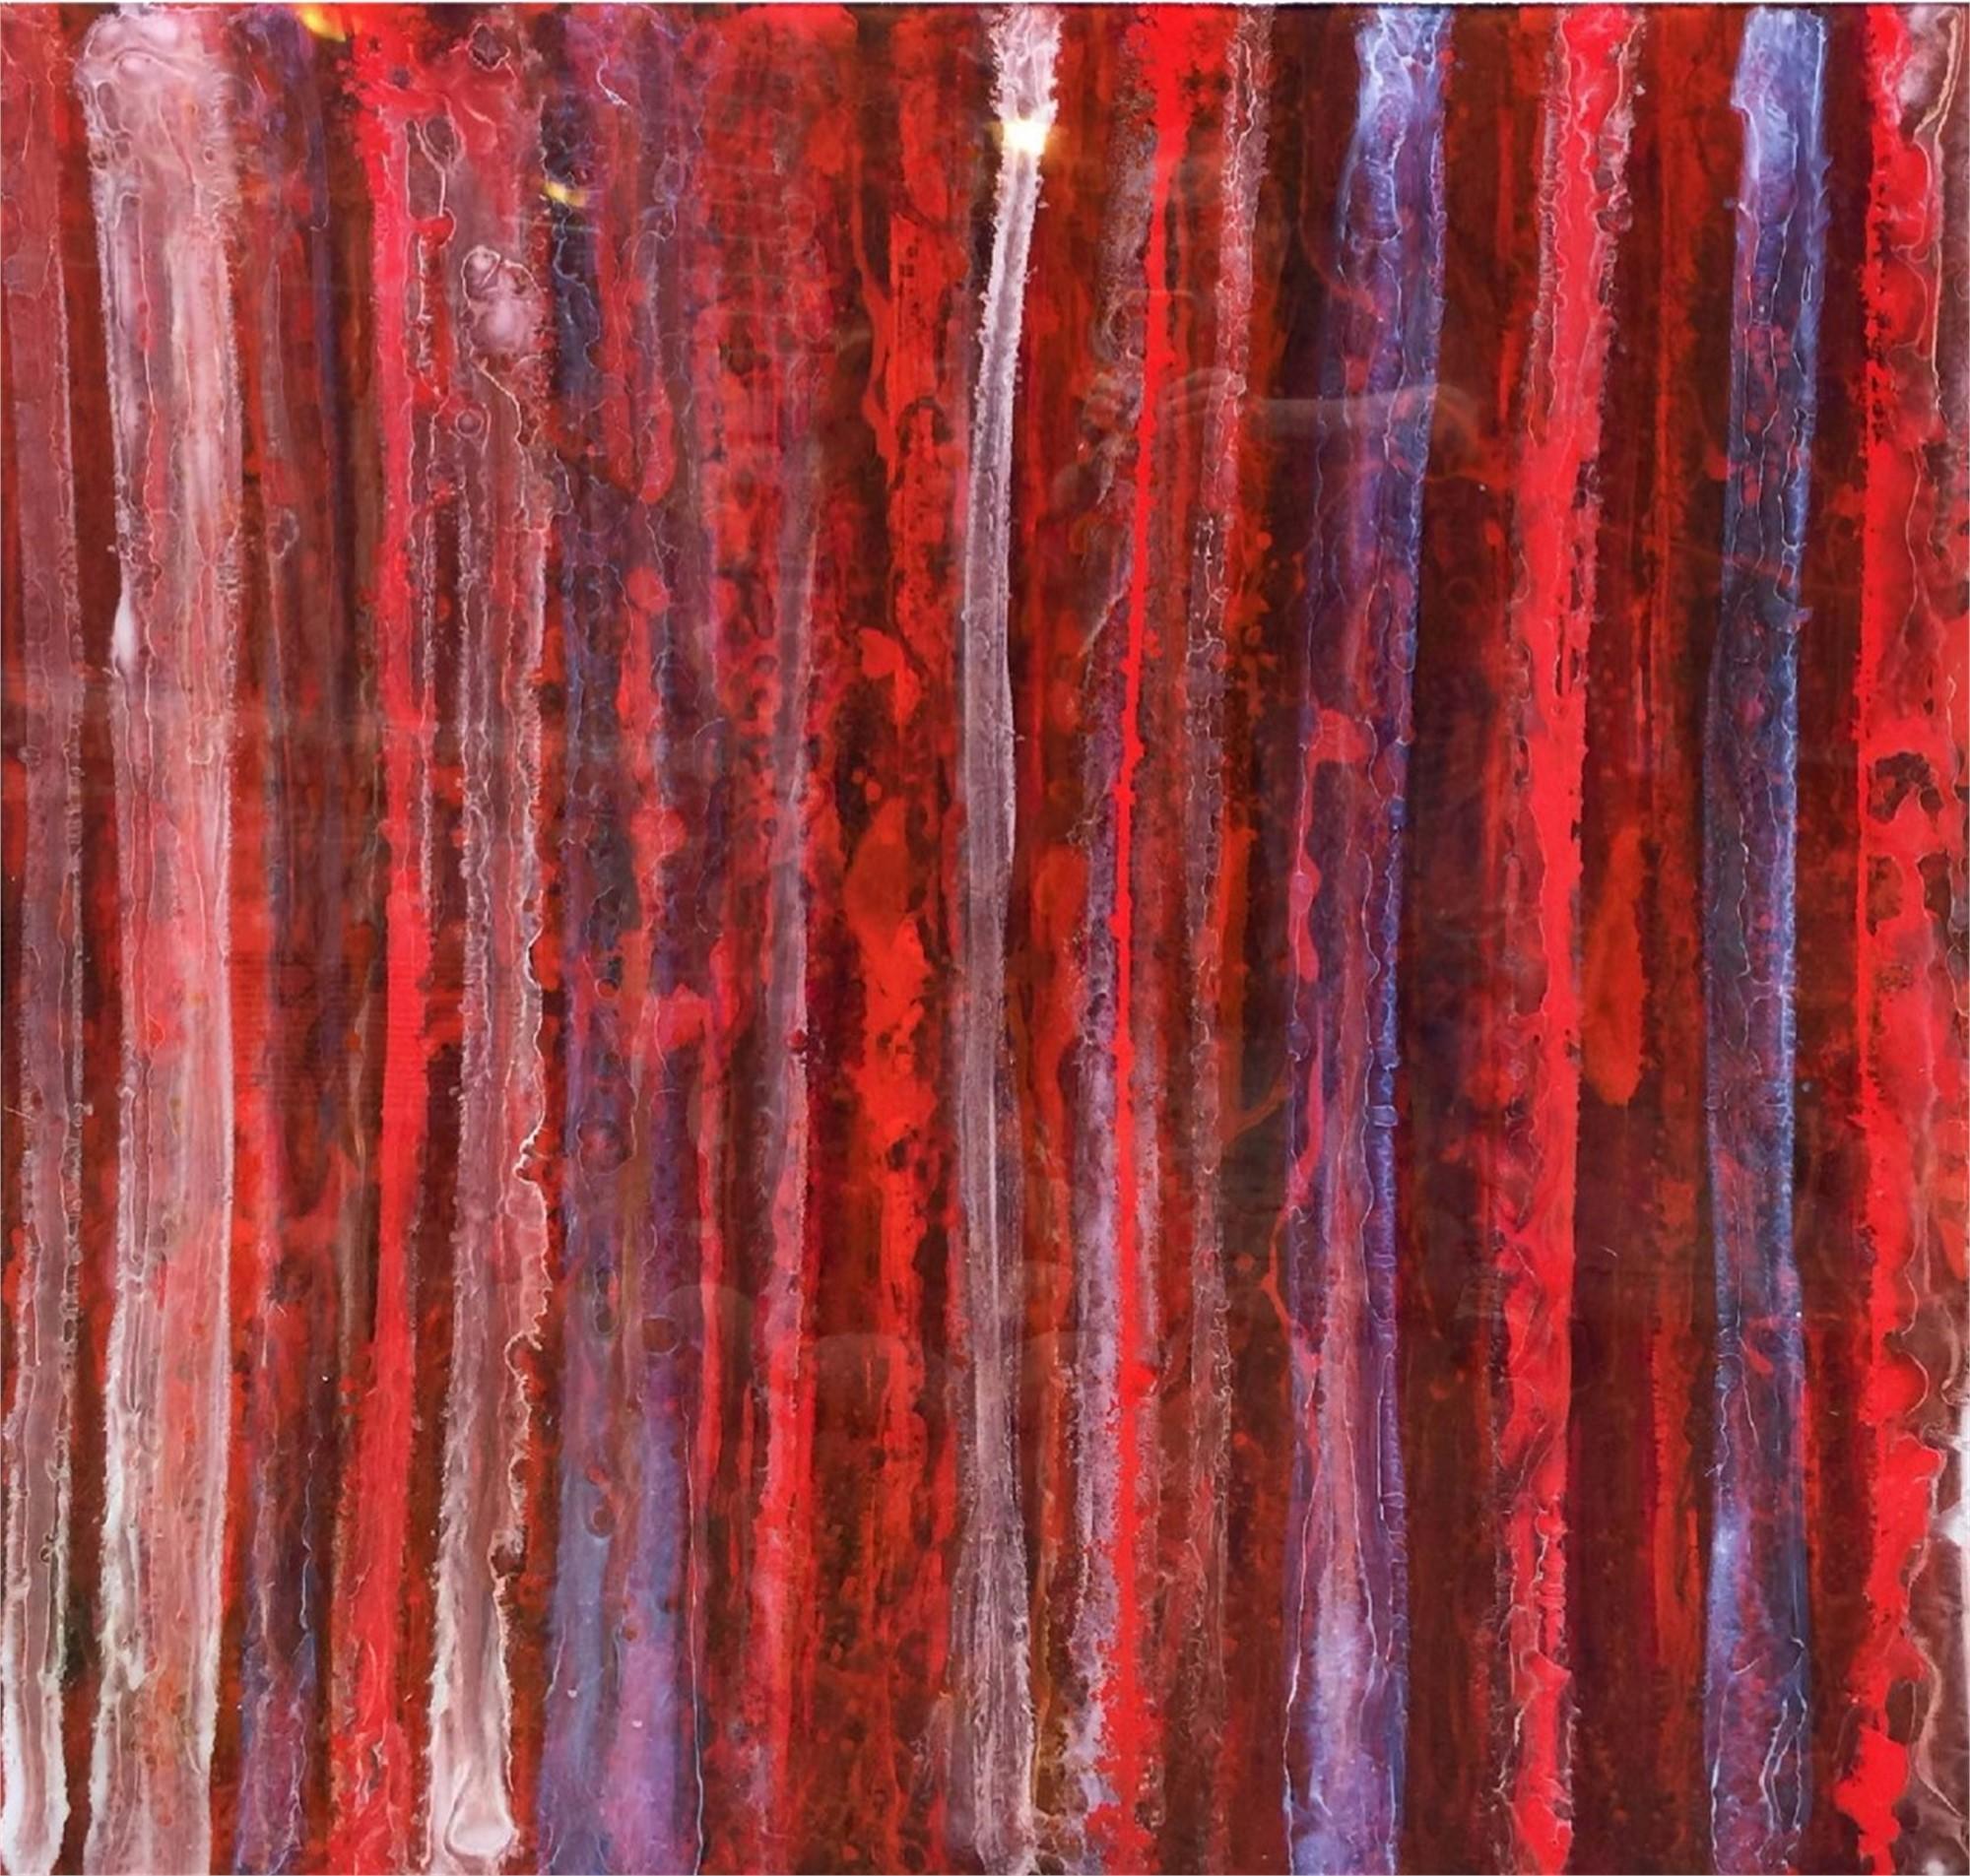 Red Shift by R. John Ichter